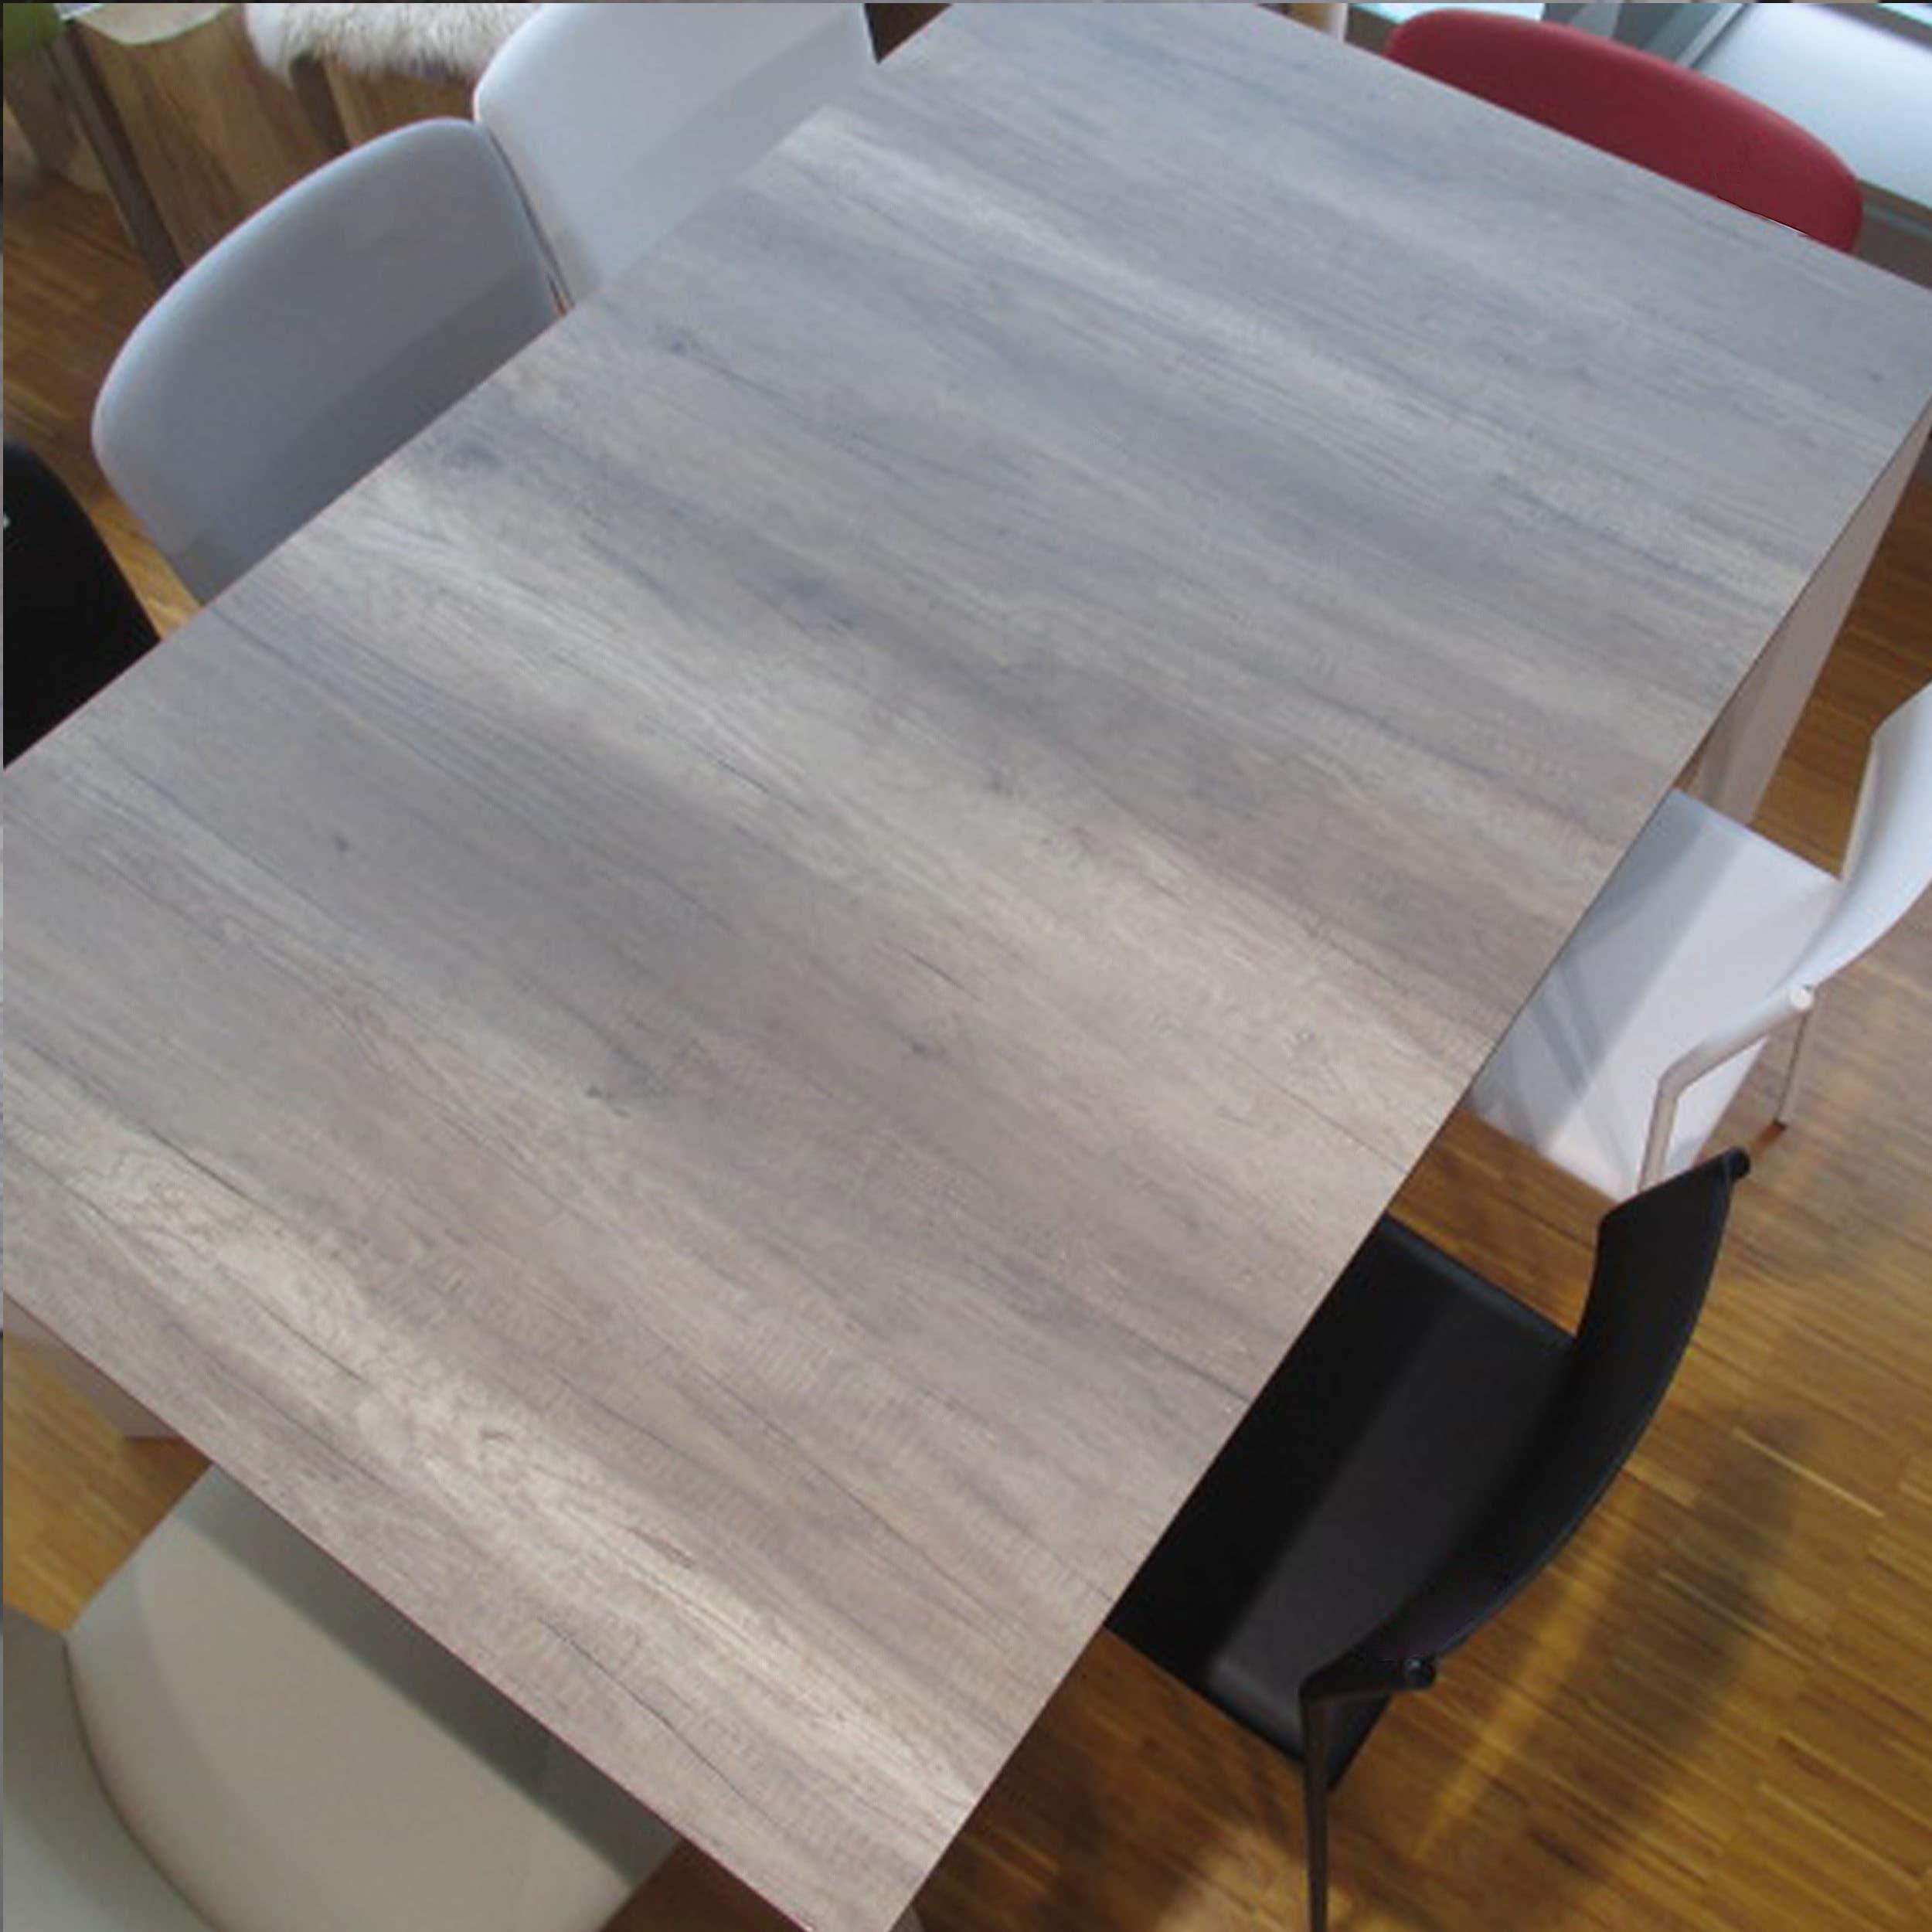 Quadrat HPL Tisch Gestell Alu